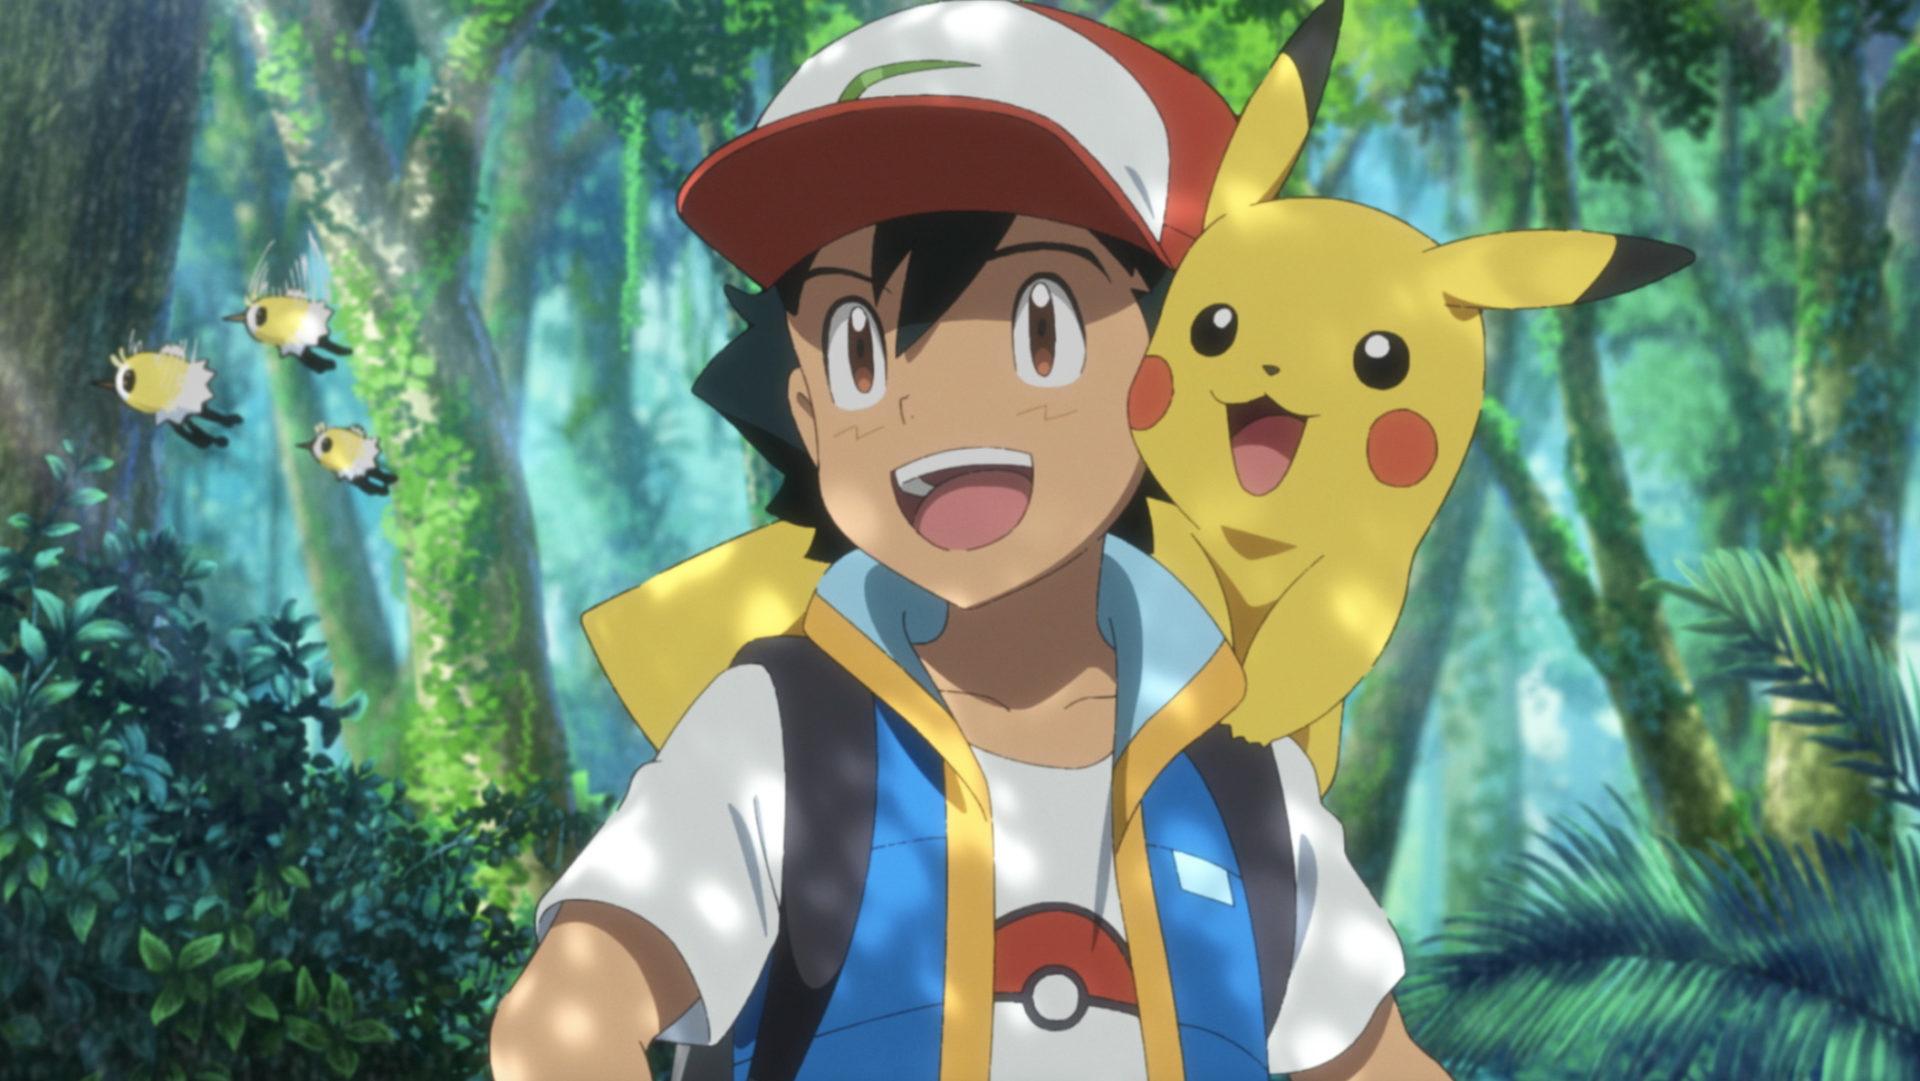 Screenshot of Ash Ketchum and Pikachu in Pokemon Secrets of the Jungle movie.